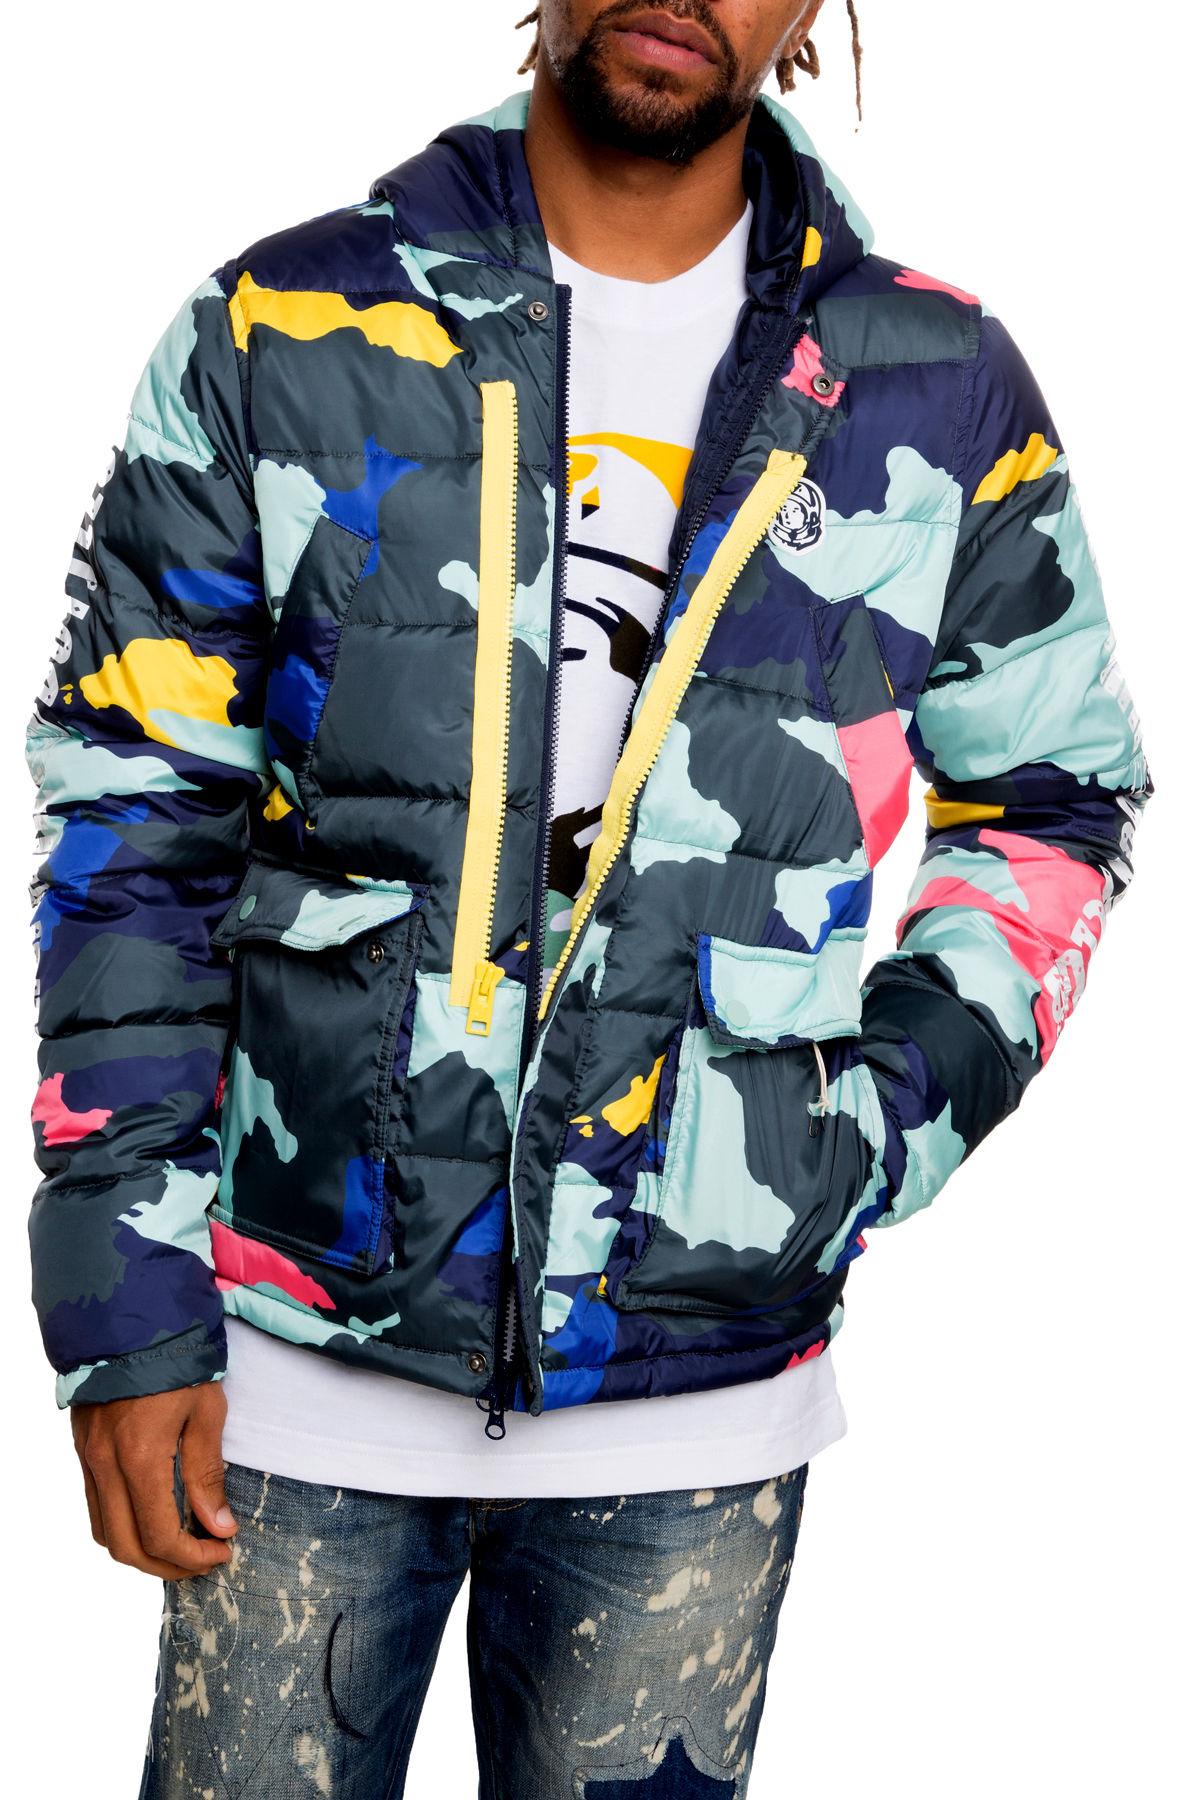 Image of The BB Park City Jacket in Hemlock